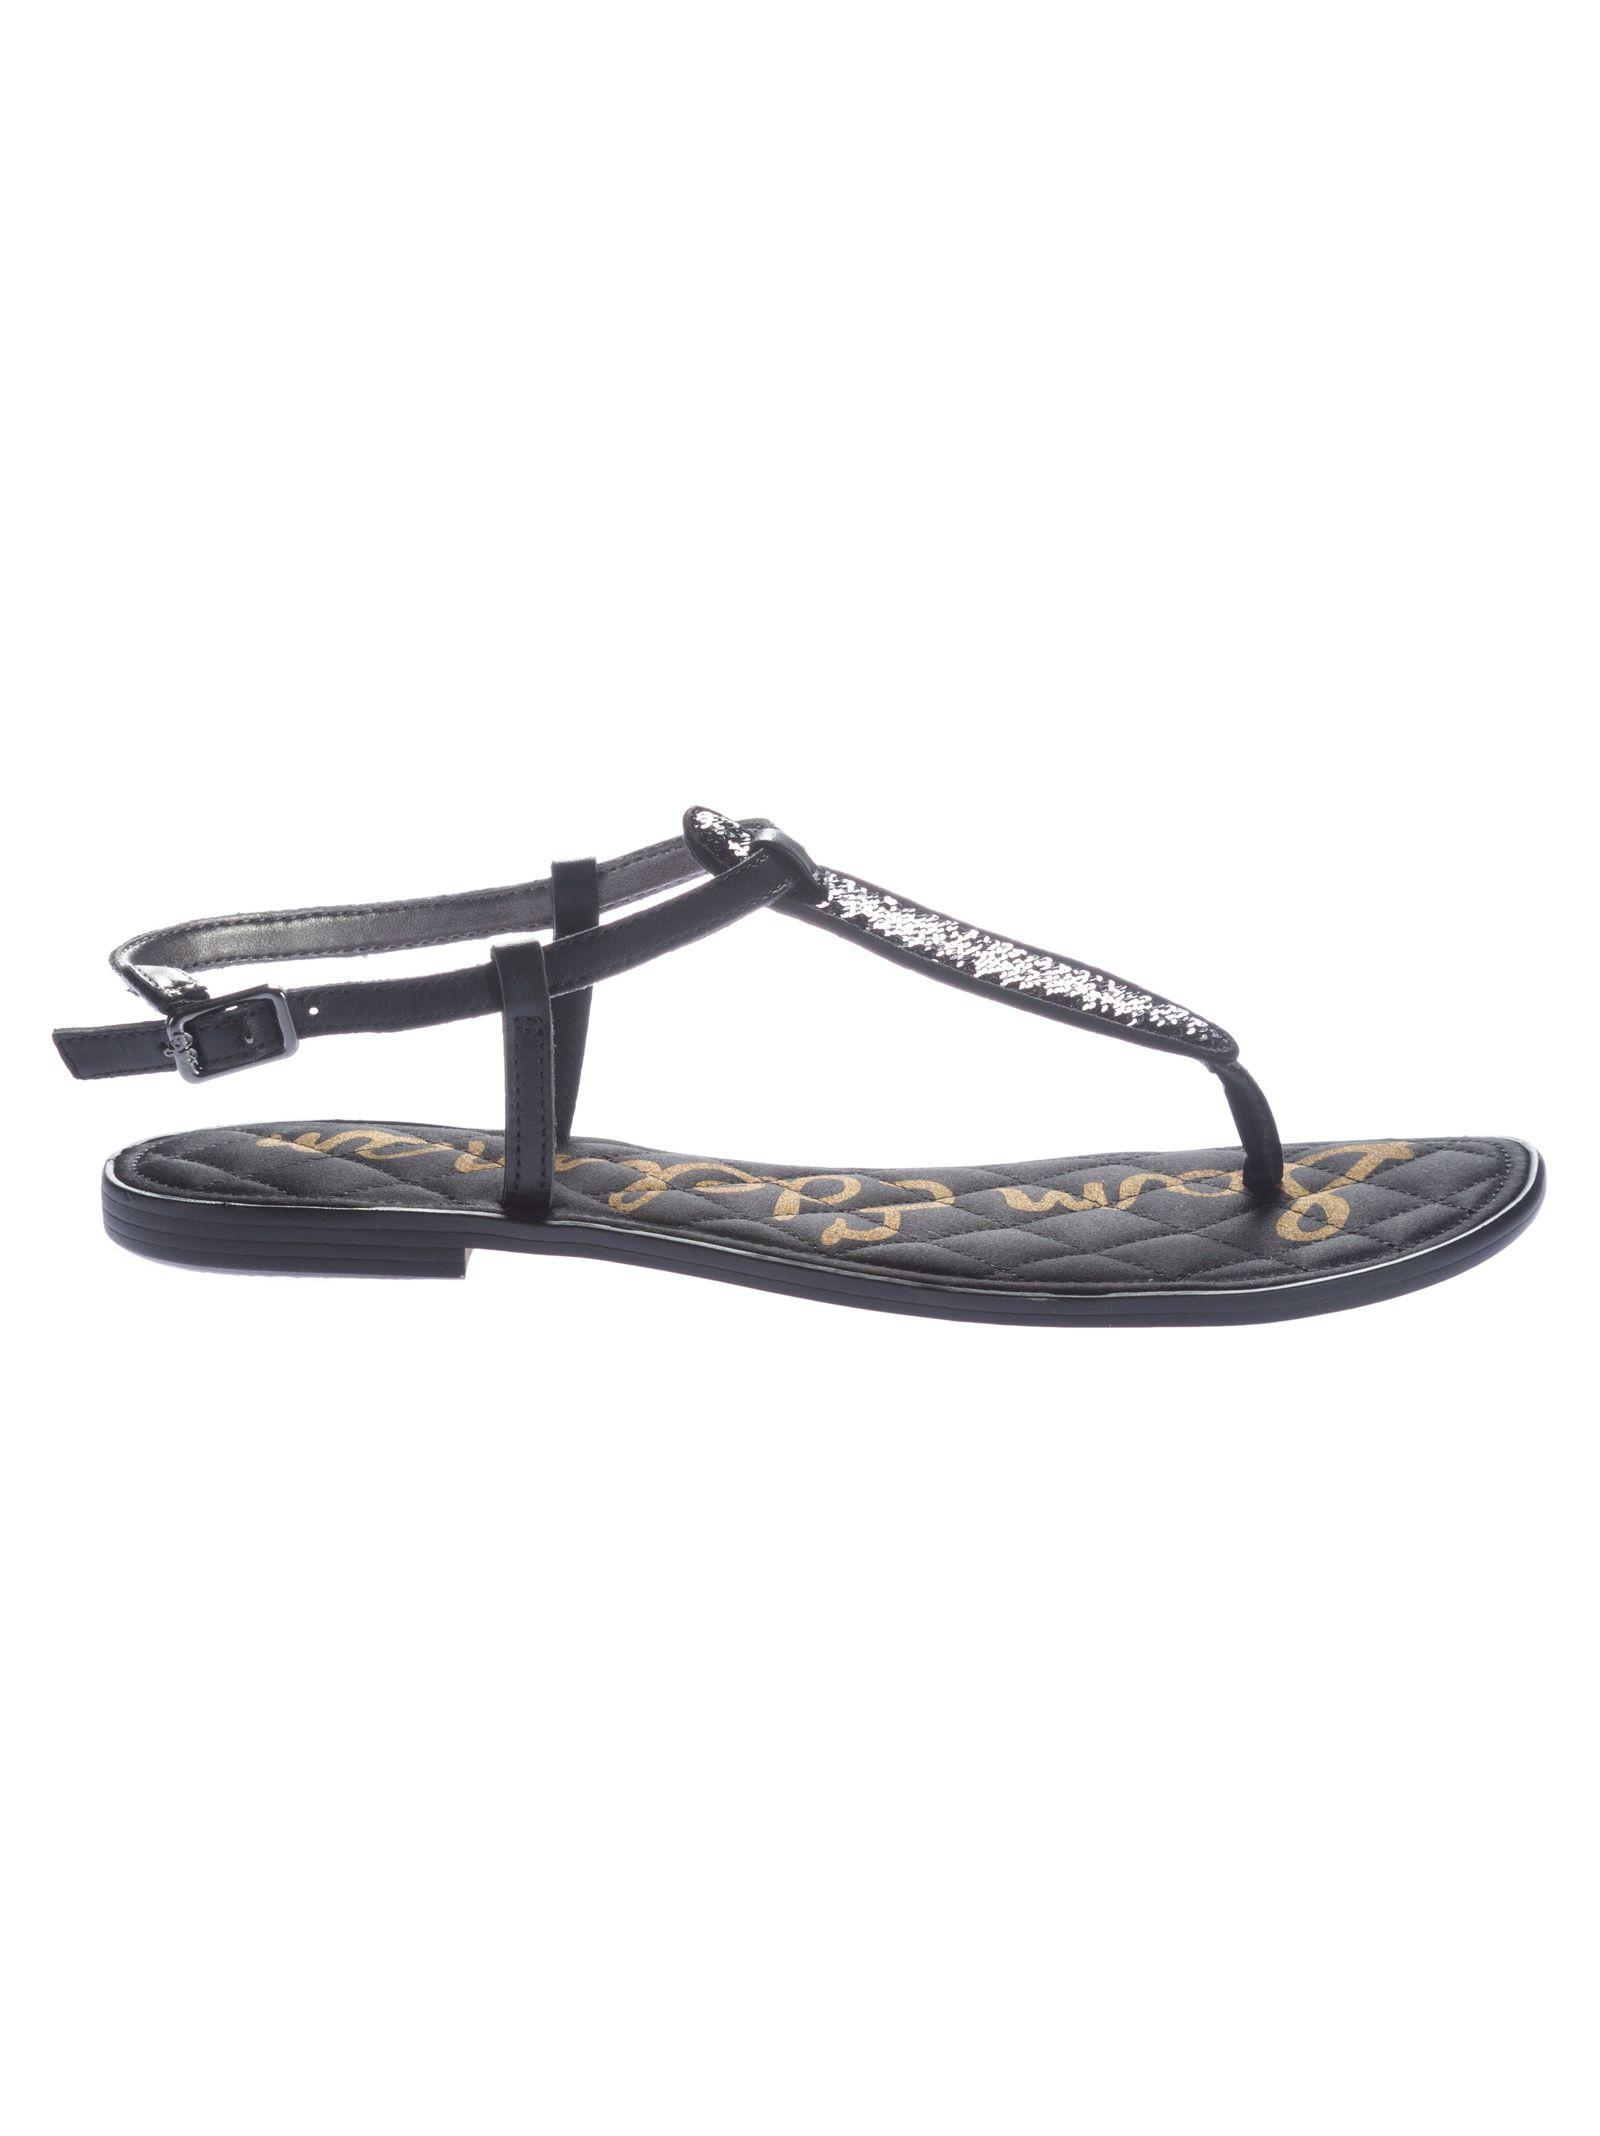 cea1cf4c498b Sam Edelman Sam Edelman Gigi Thong Flat Sandals - Black - 10578851 ...